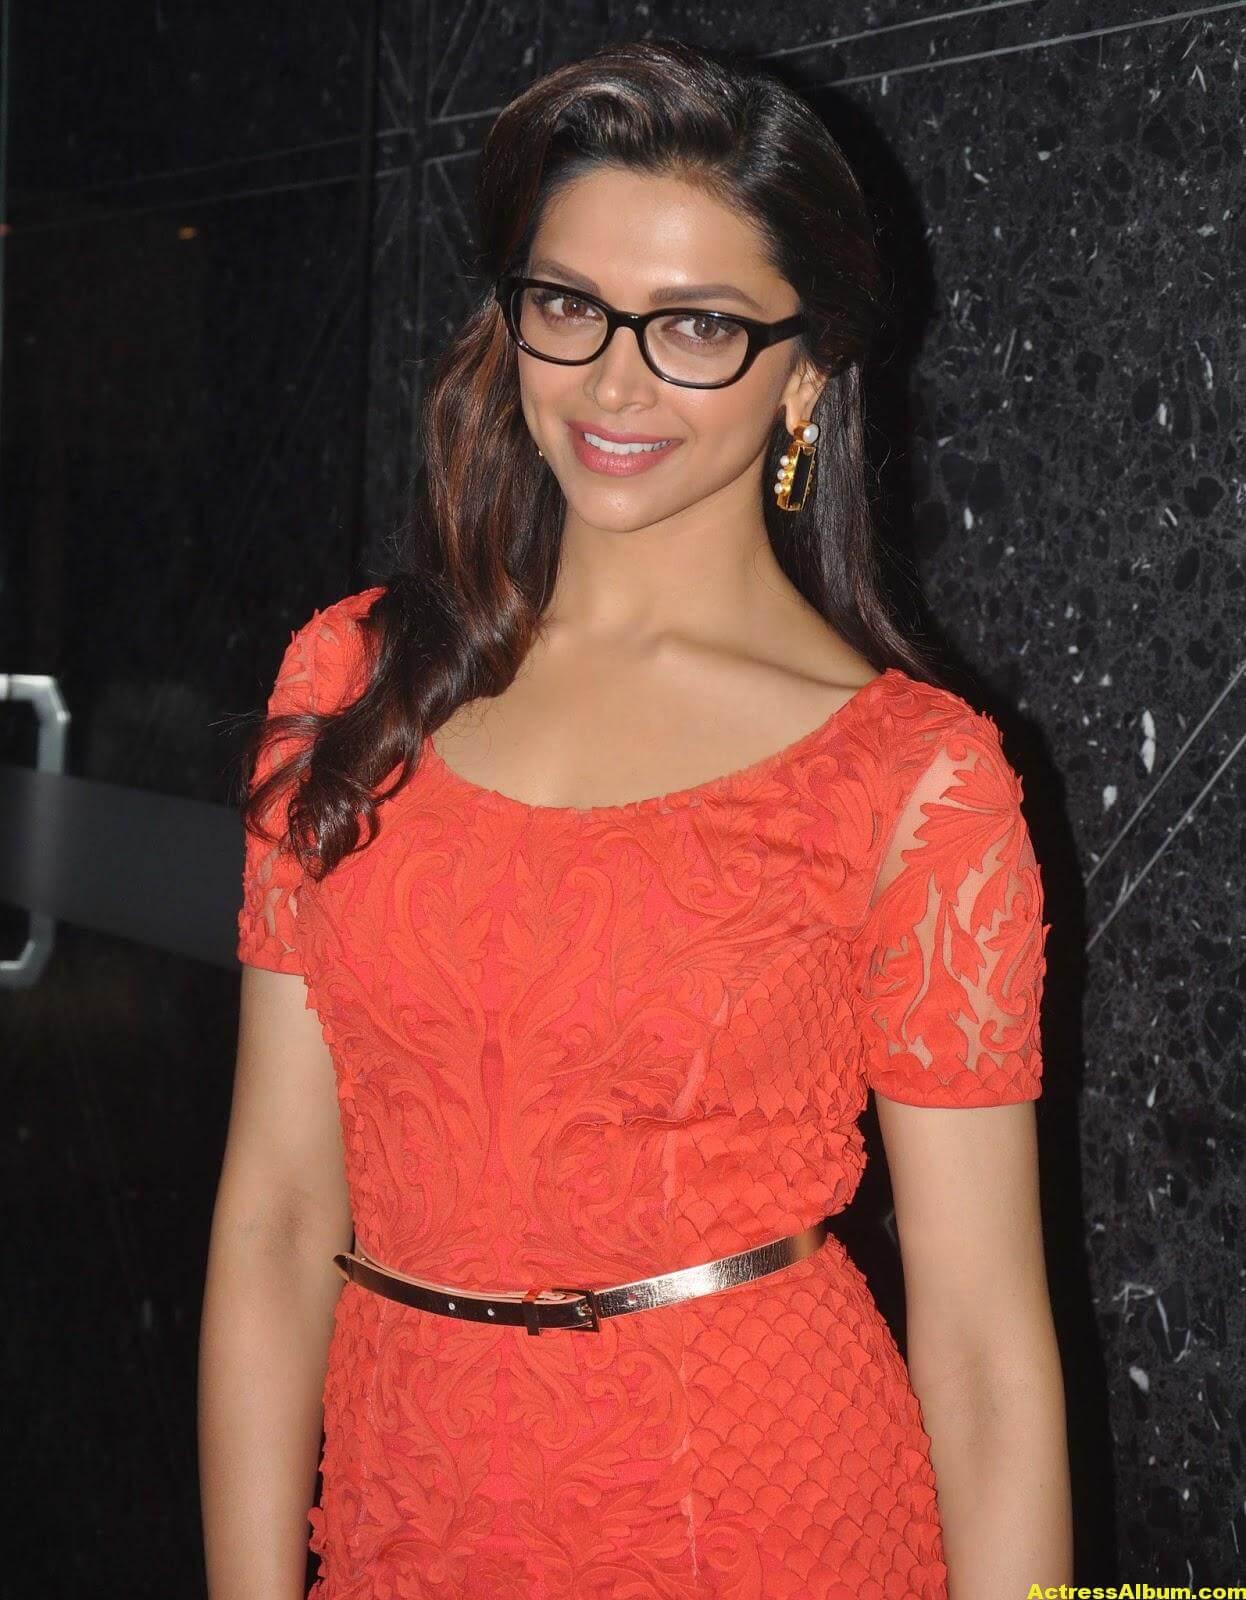 Deepika Padukone Photos In Orange Dress With Glass 4